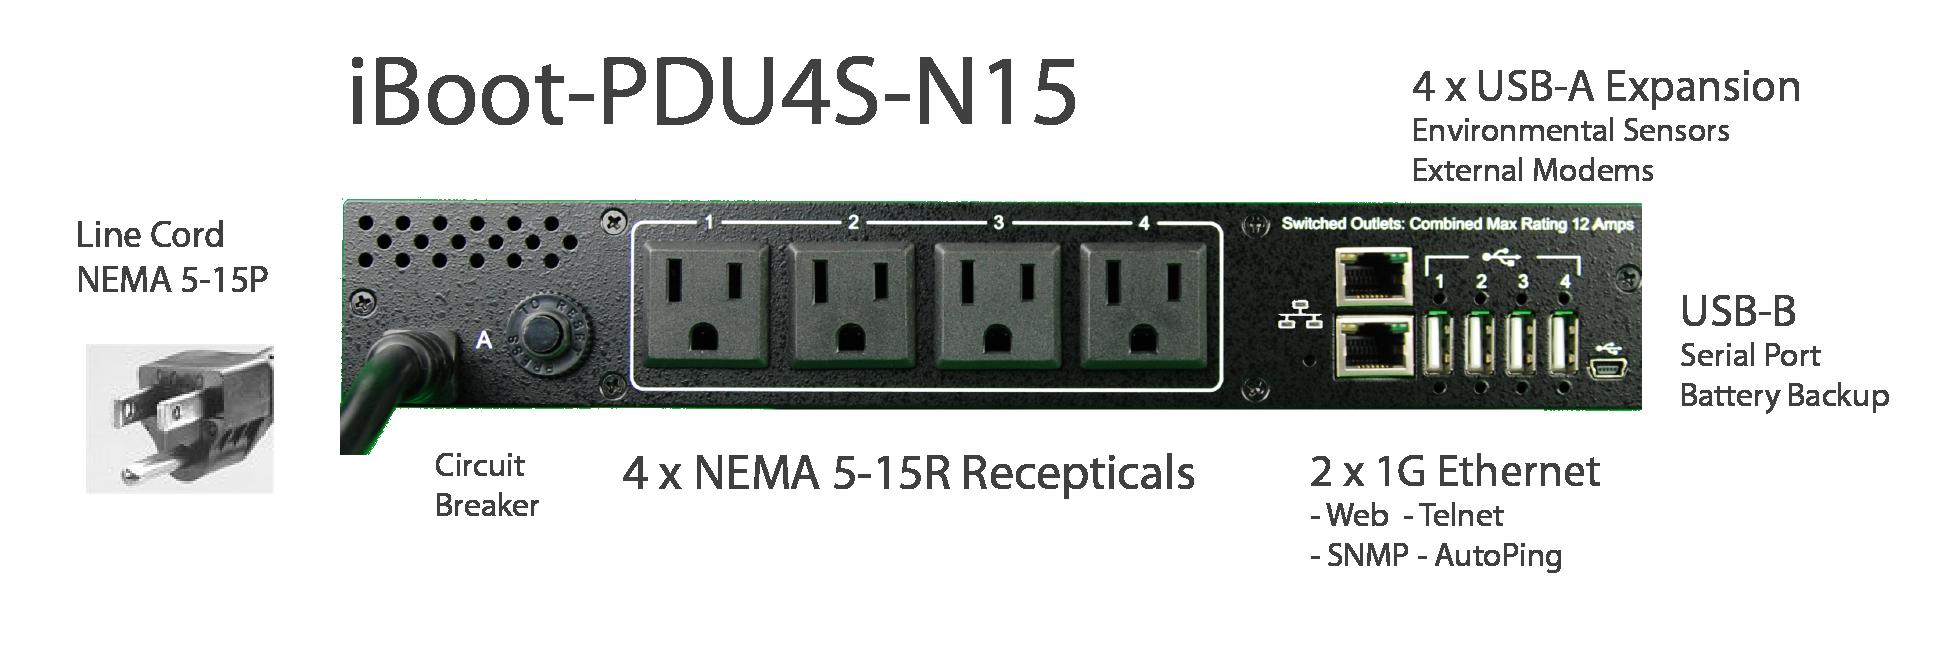 iBoot-PDU4S-N15 for Remote Reboot,1 x NEMA 5-15P.